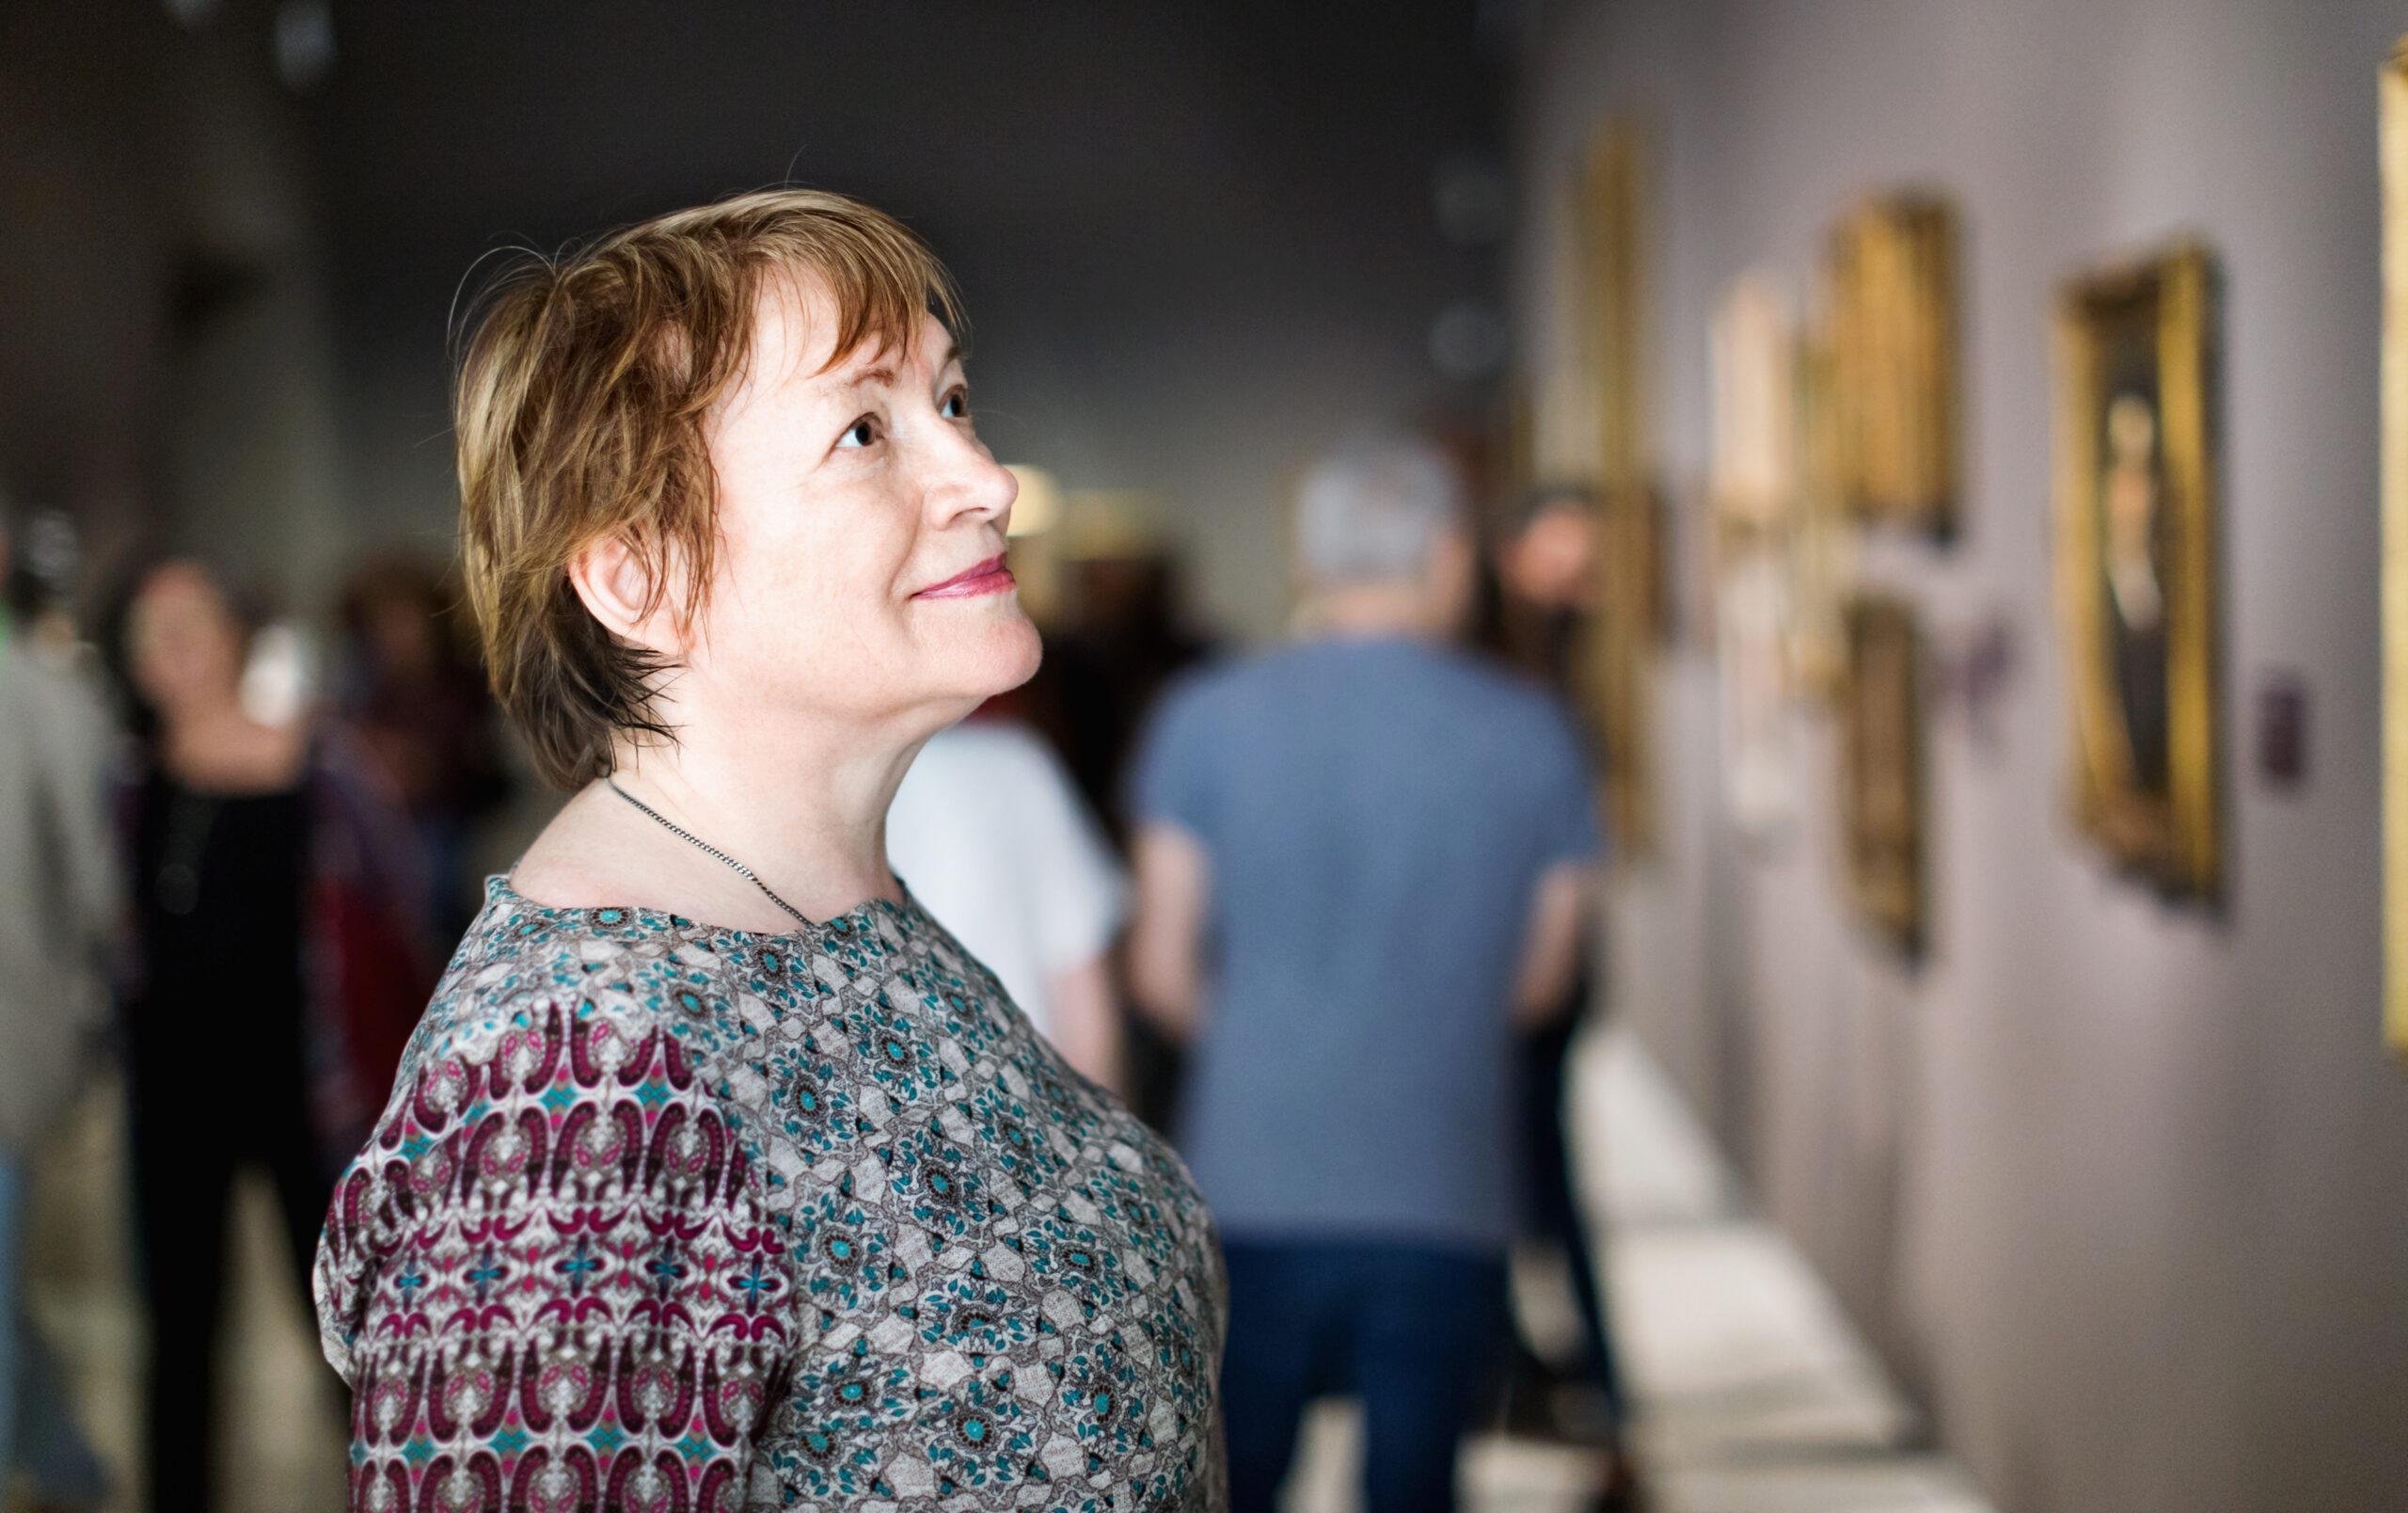 Woman enjoys a gallery visit.